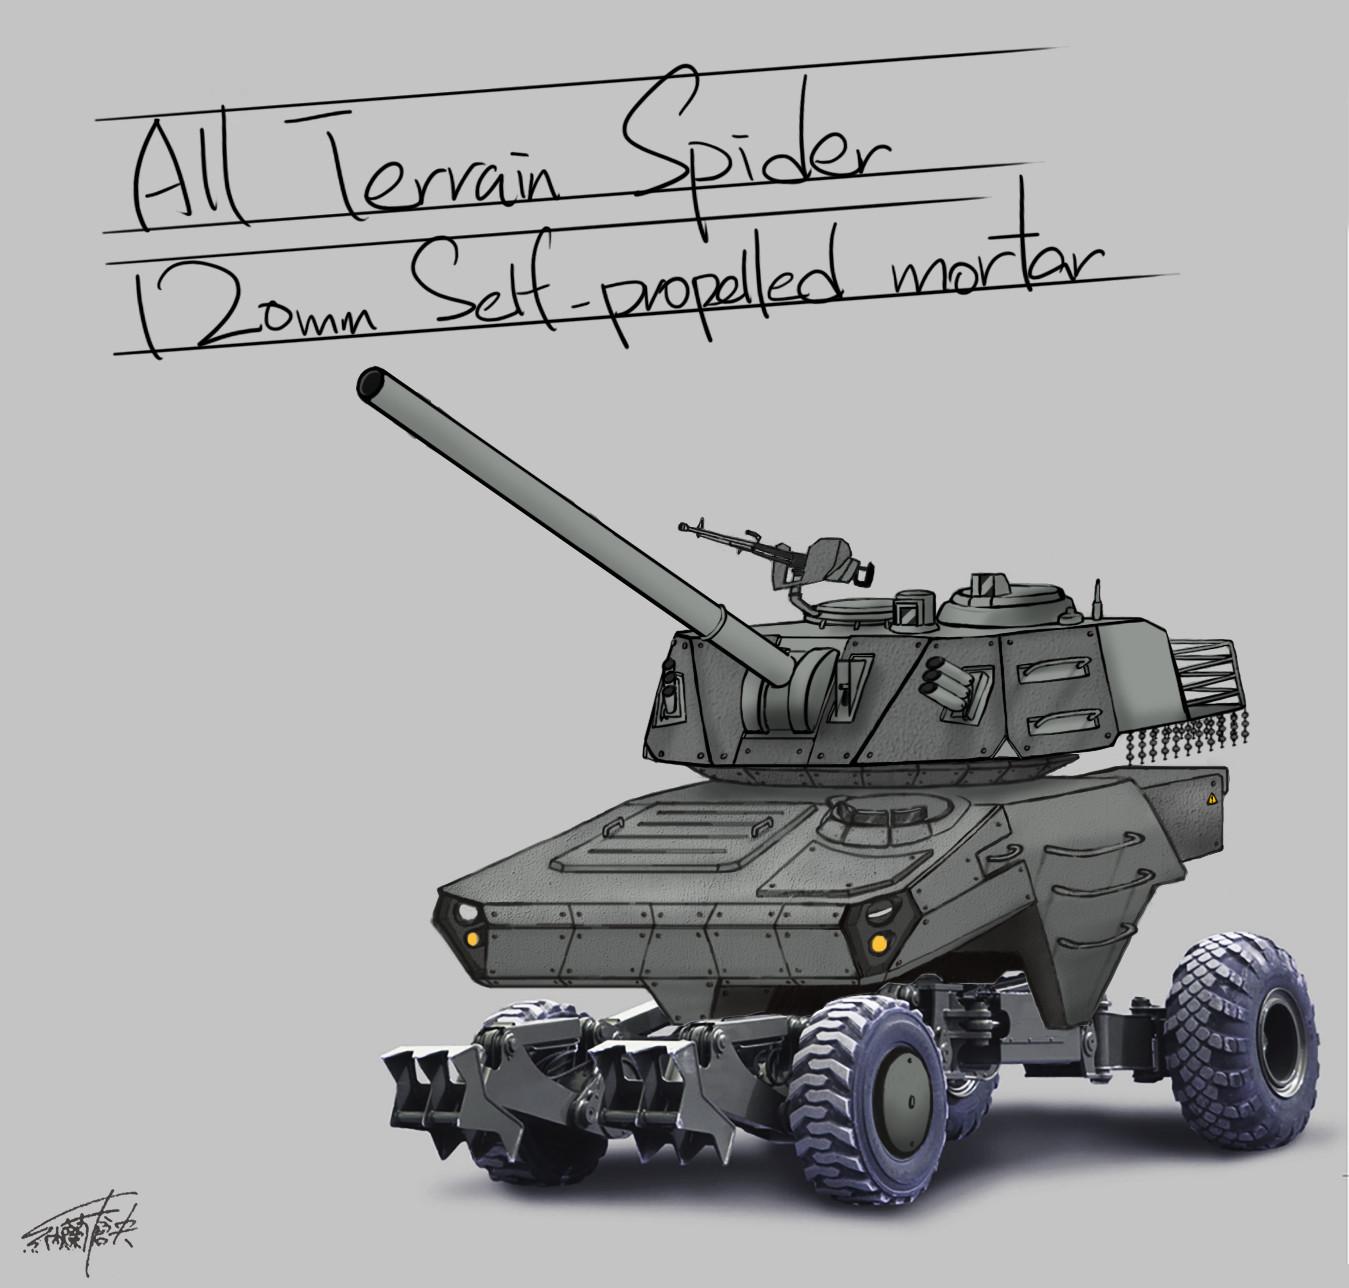 All Terrain Spider  120mm self-propelled mortar